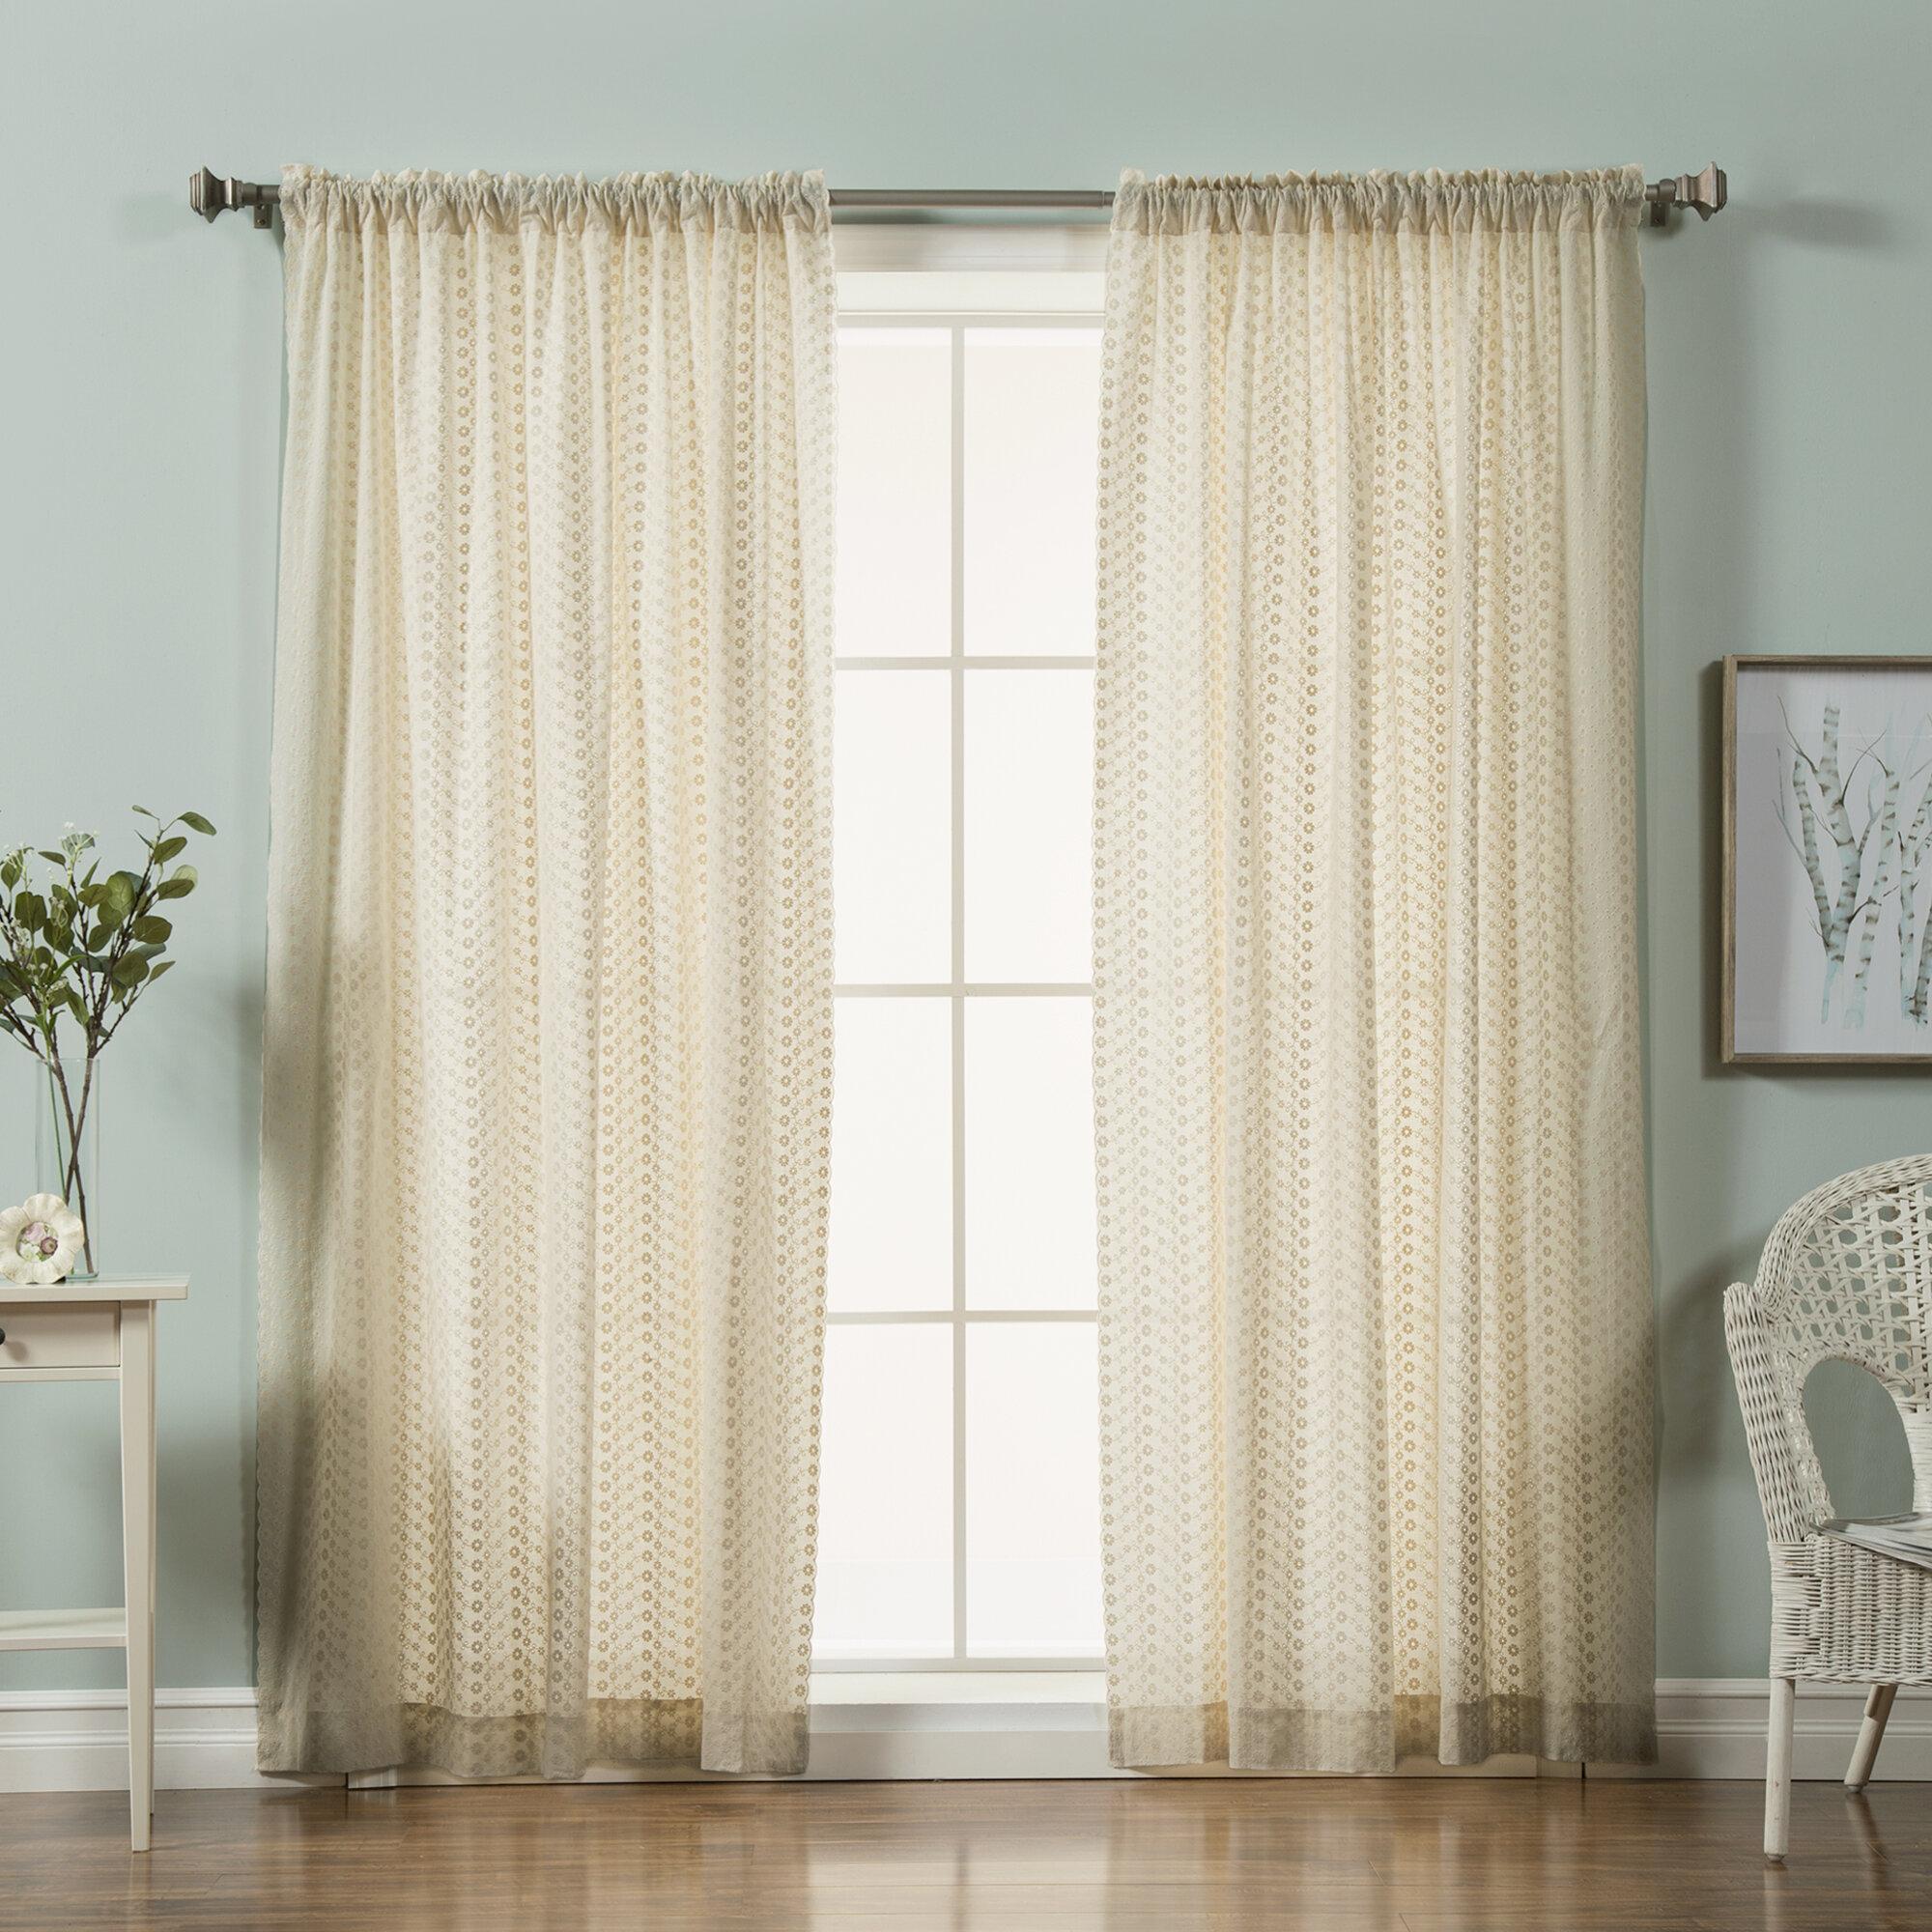 budget rods blog mini friendly curtains white my bestcurtainrodikea effortless favorite ikea style rod curtain portion